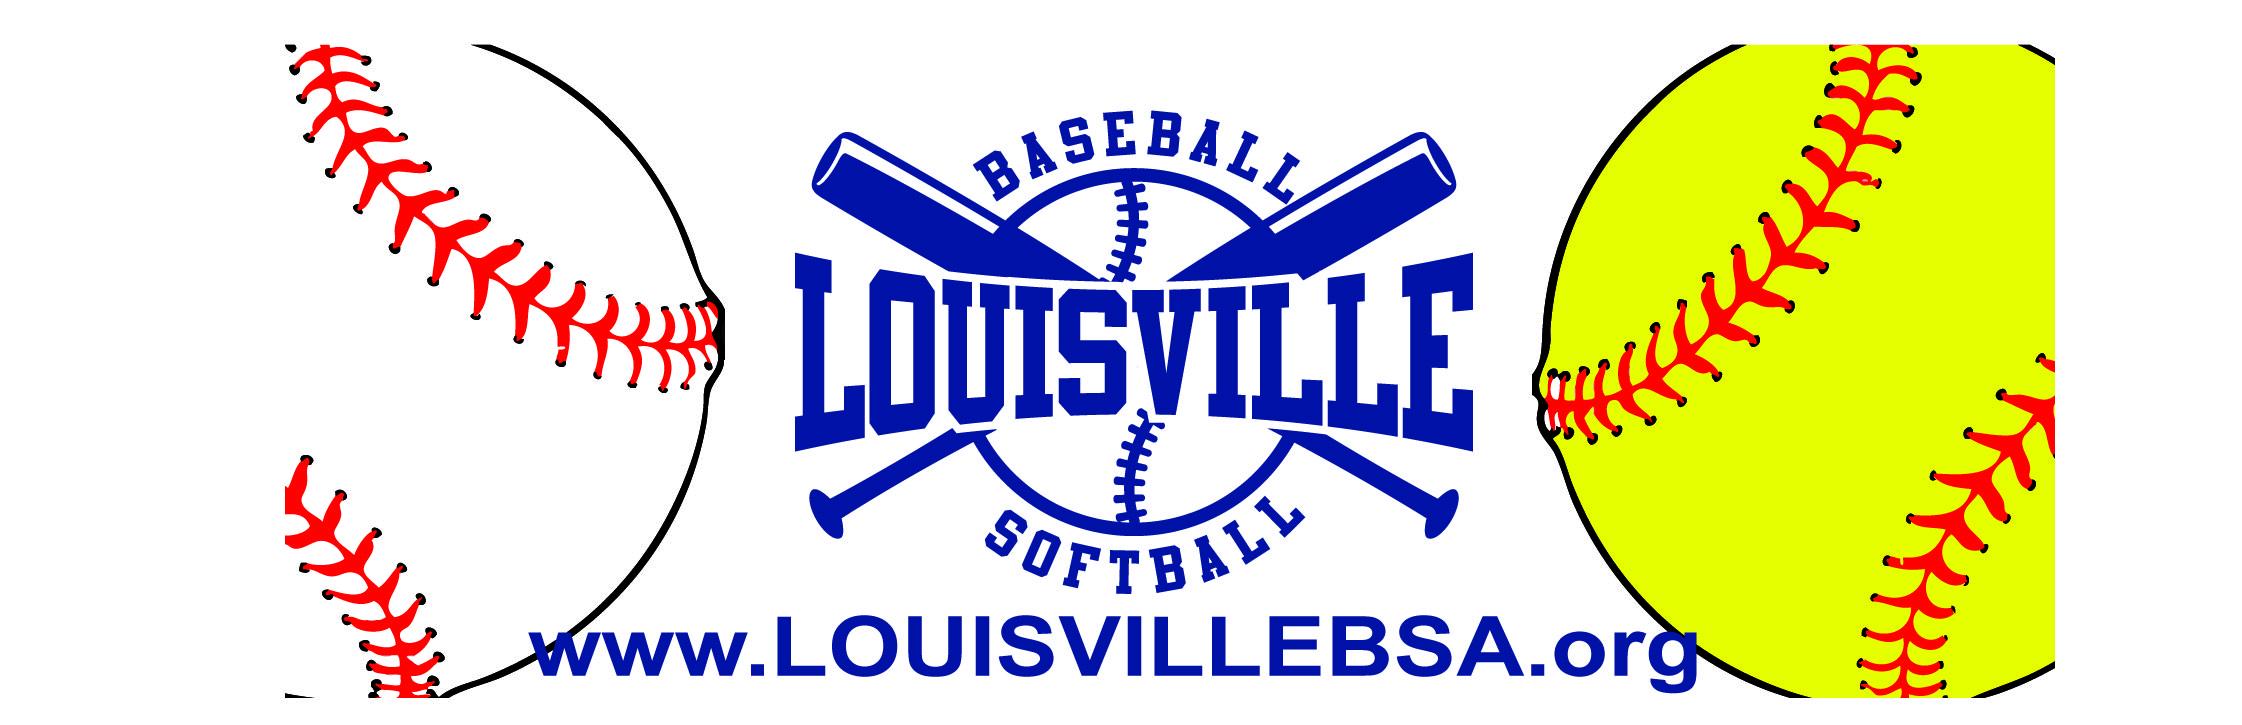 Louisville Baseball and Softball Association, Baseball, Run, Field